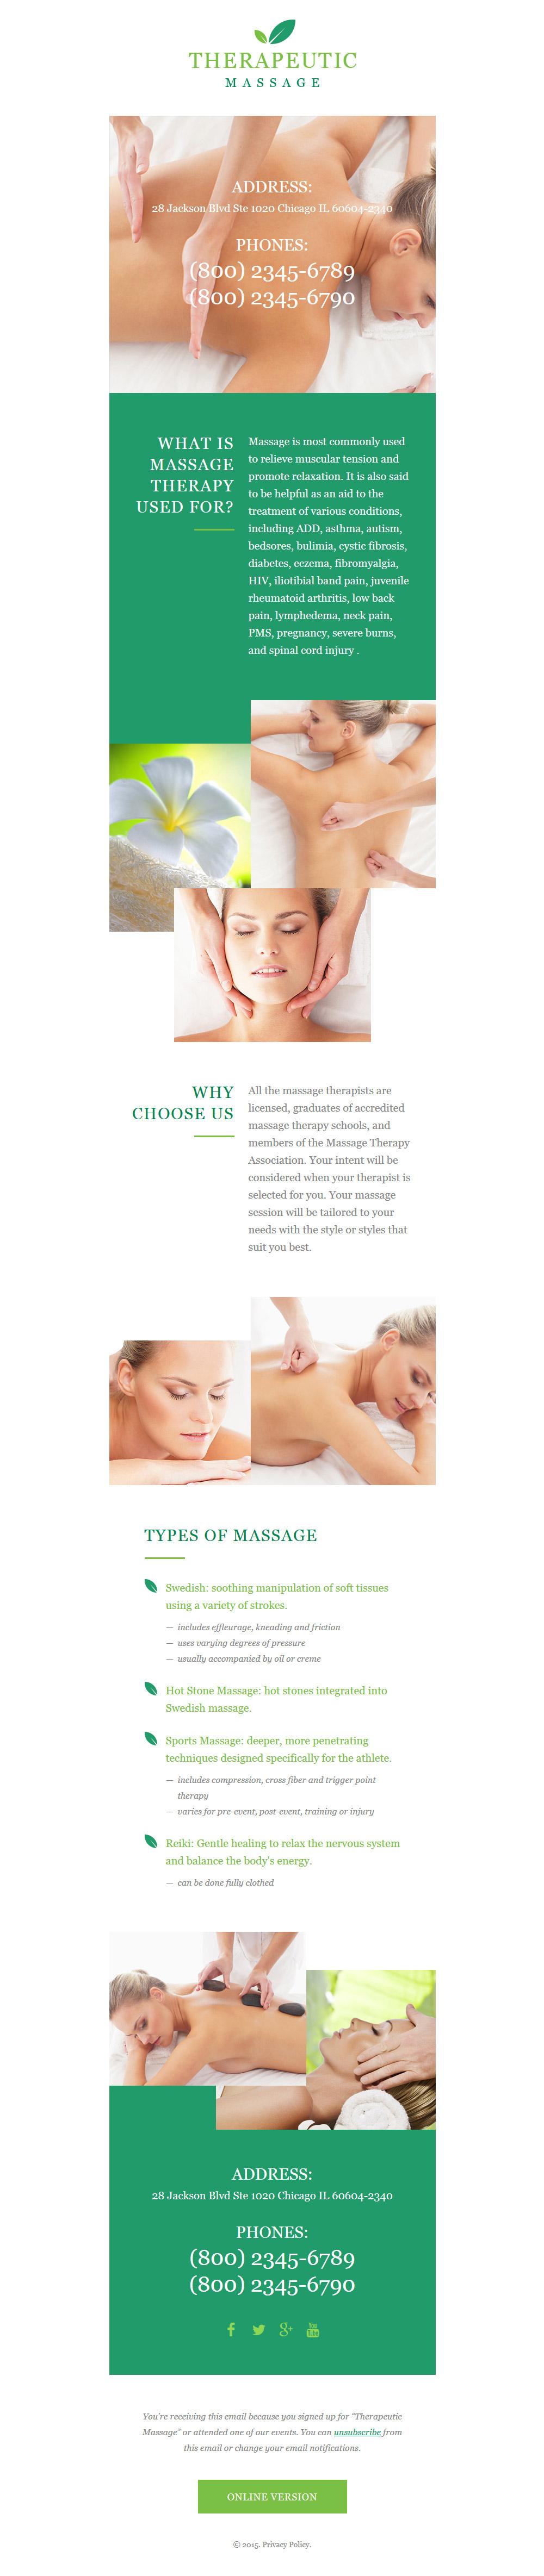 Responsive Nieuwsbrief Template over Massage Salon №57958